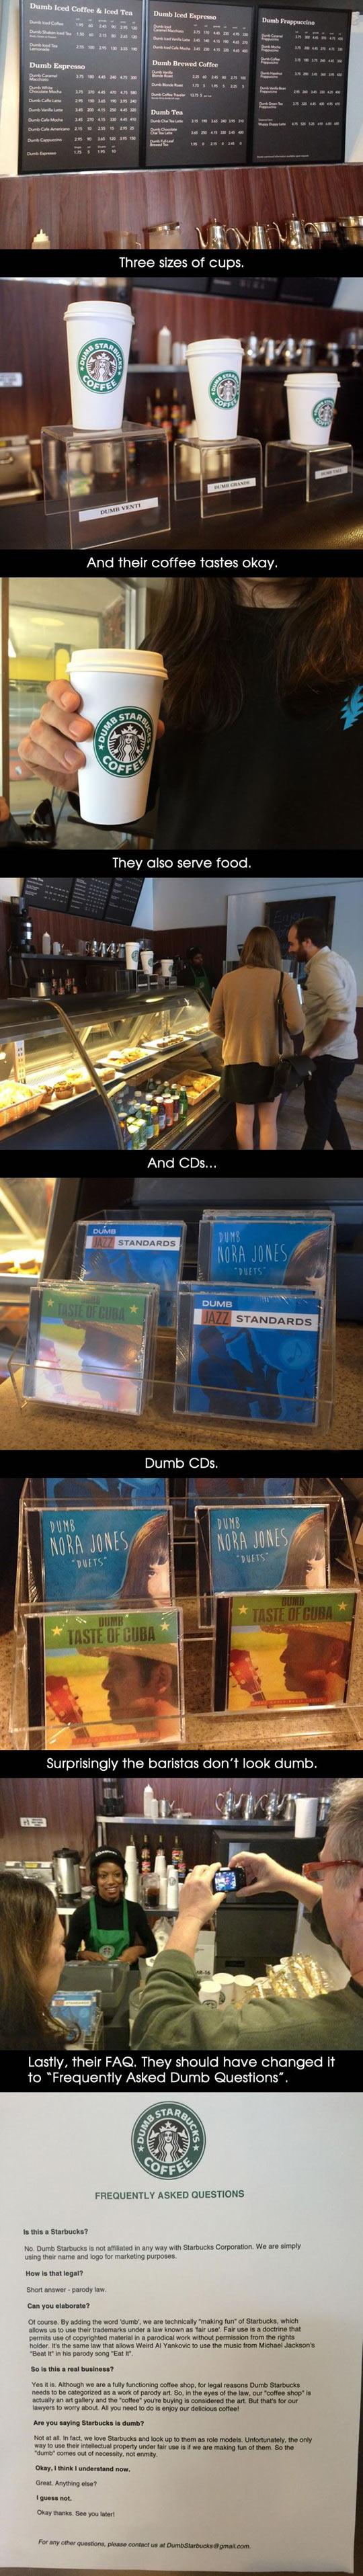 funny-dumb-Starbucks-coffee-shop-parody-clients